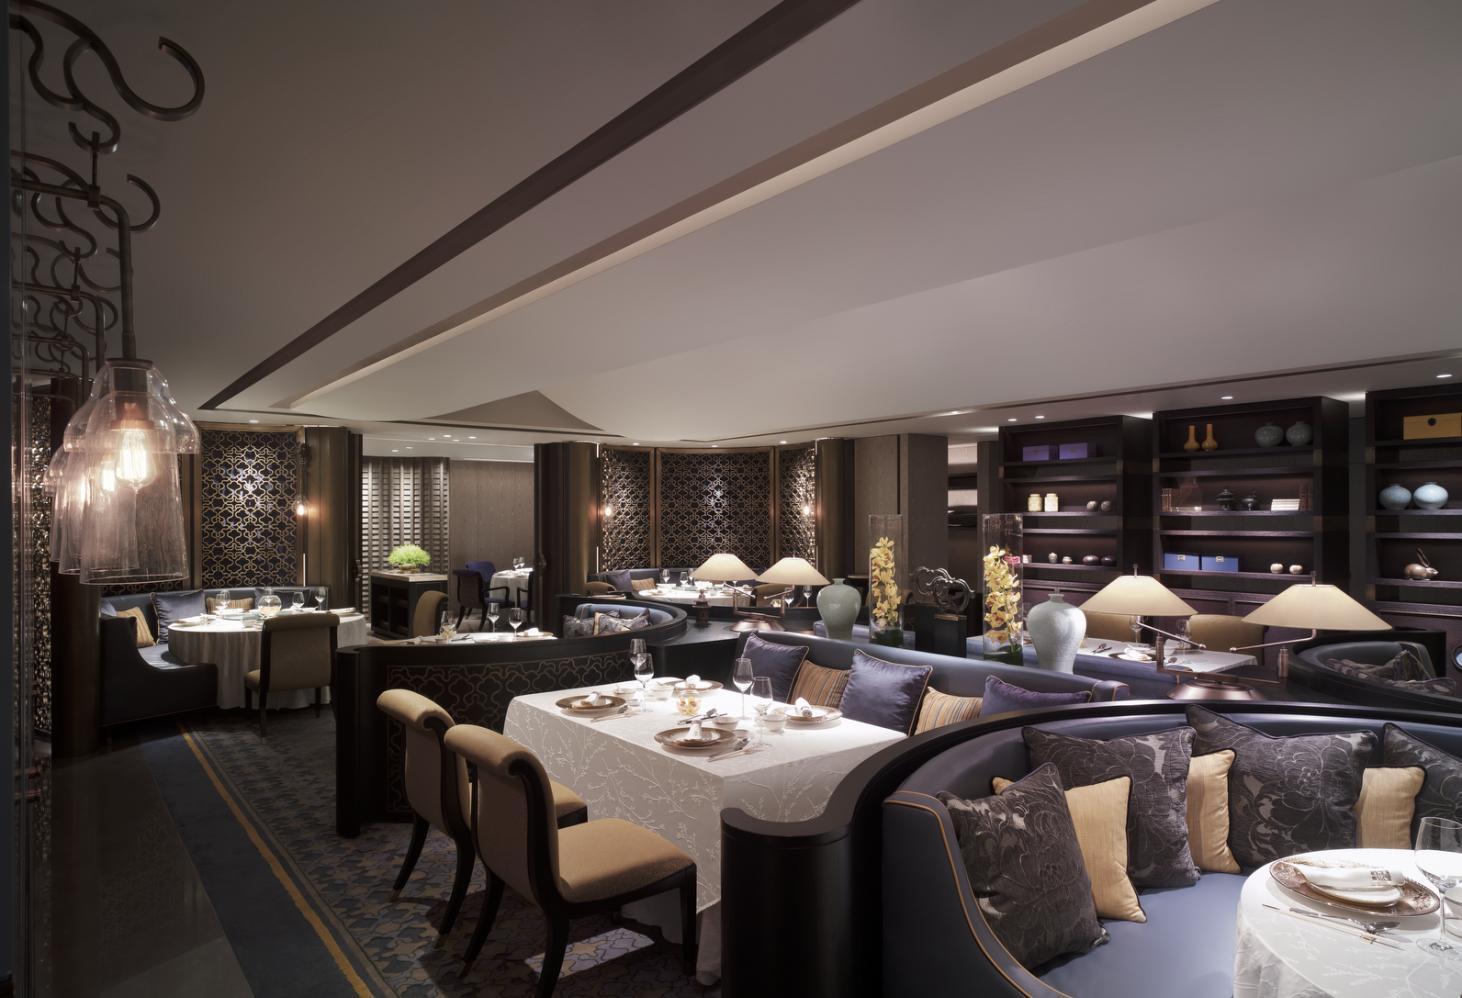 Турция. Истамбул. Отель Шангри-Ла Босфор (Shangri-La Bosphorus in Istanbul)